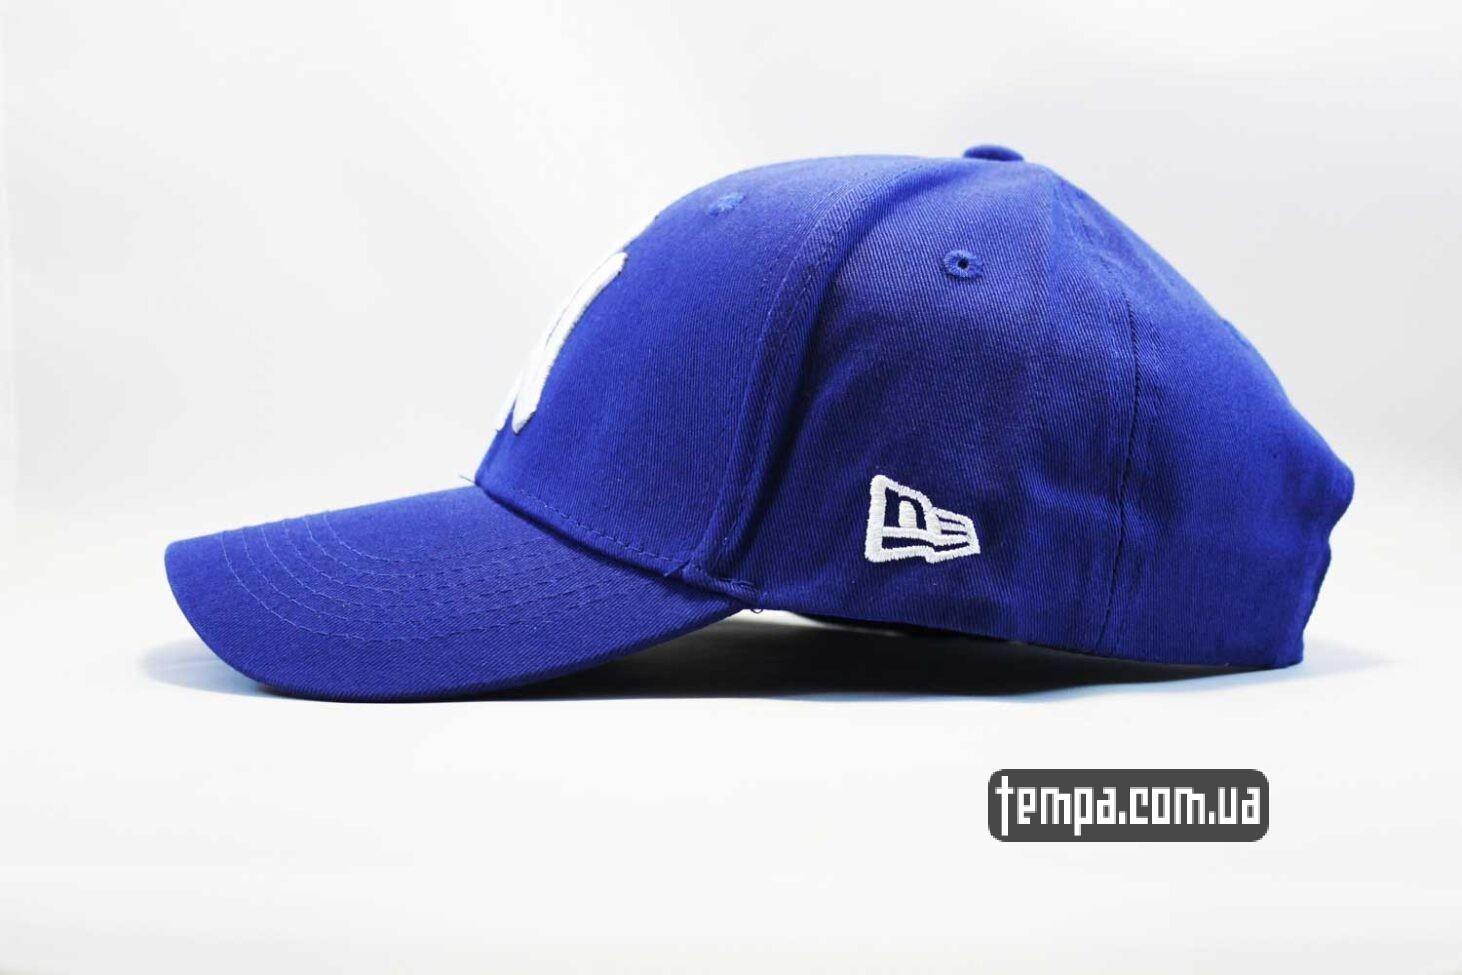 янкис синяя кепка бейсболка yankees New York NY New Era синяя